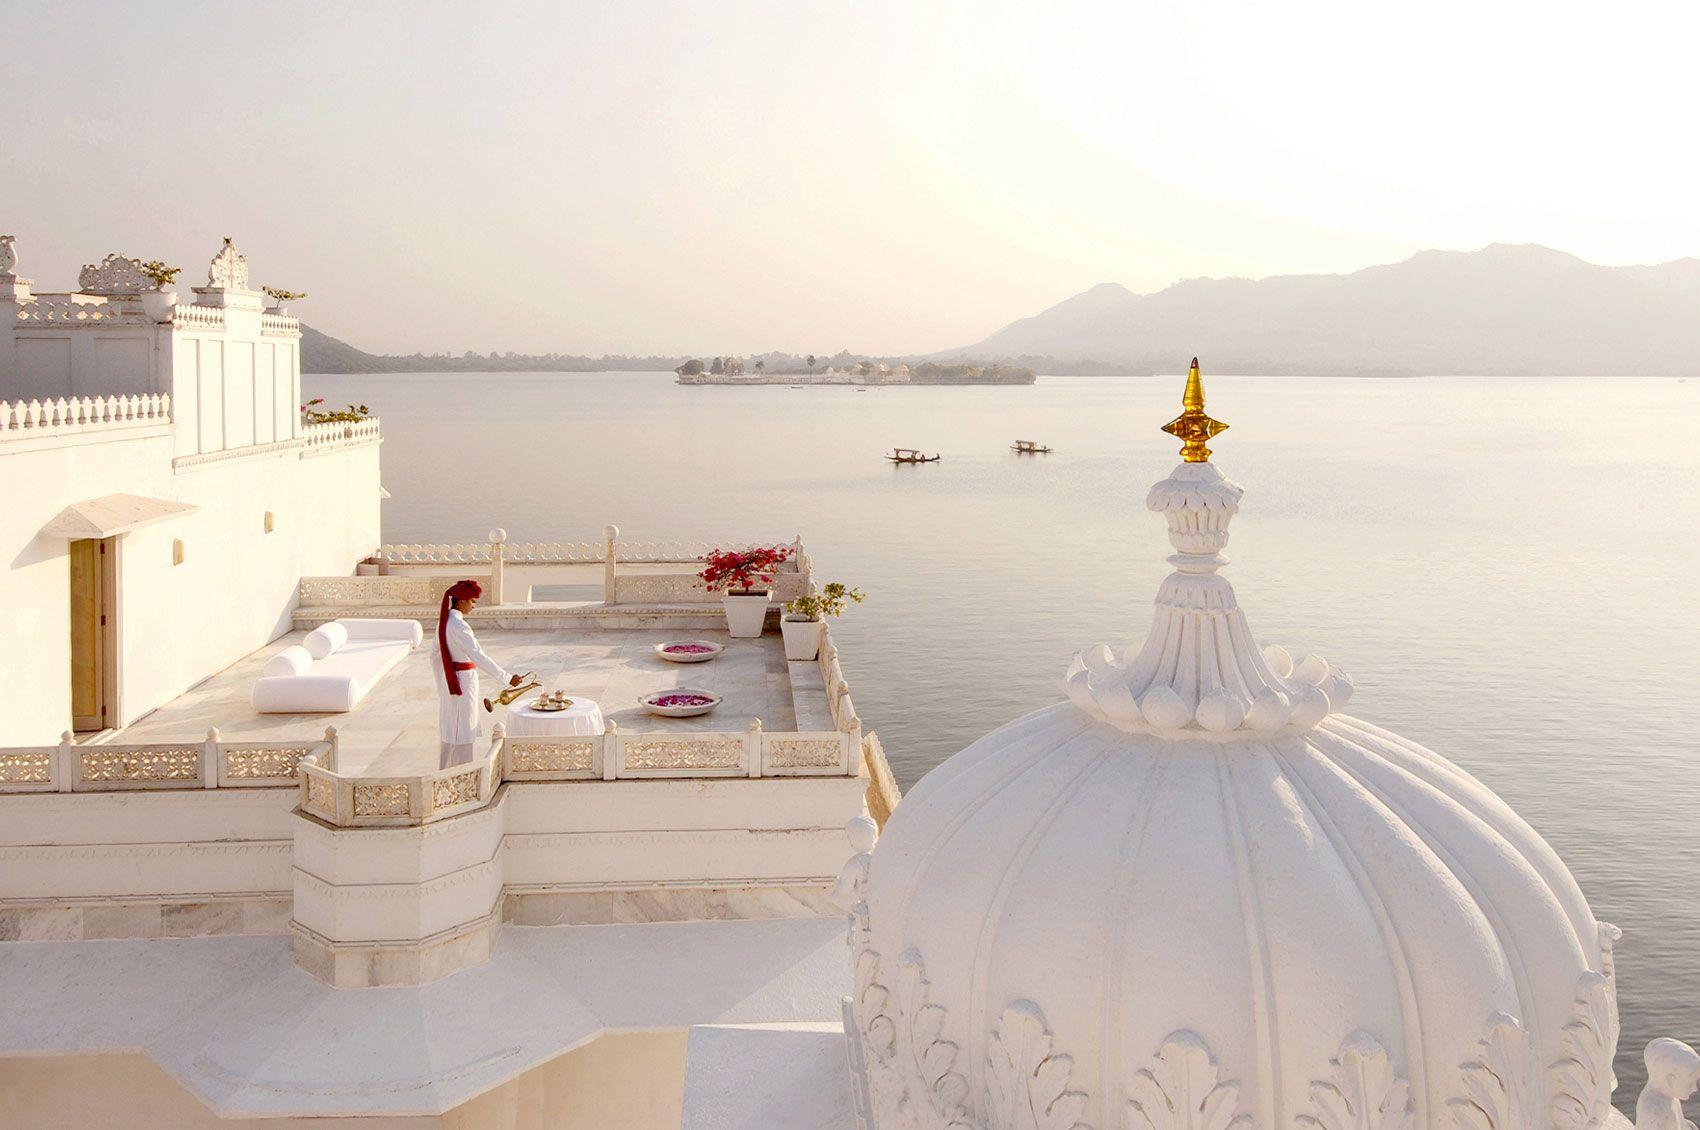 Taj Lake #Palace, #Rajasthan, #India